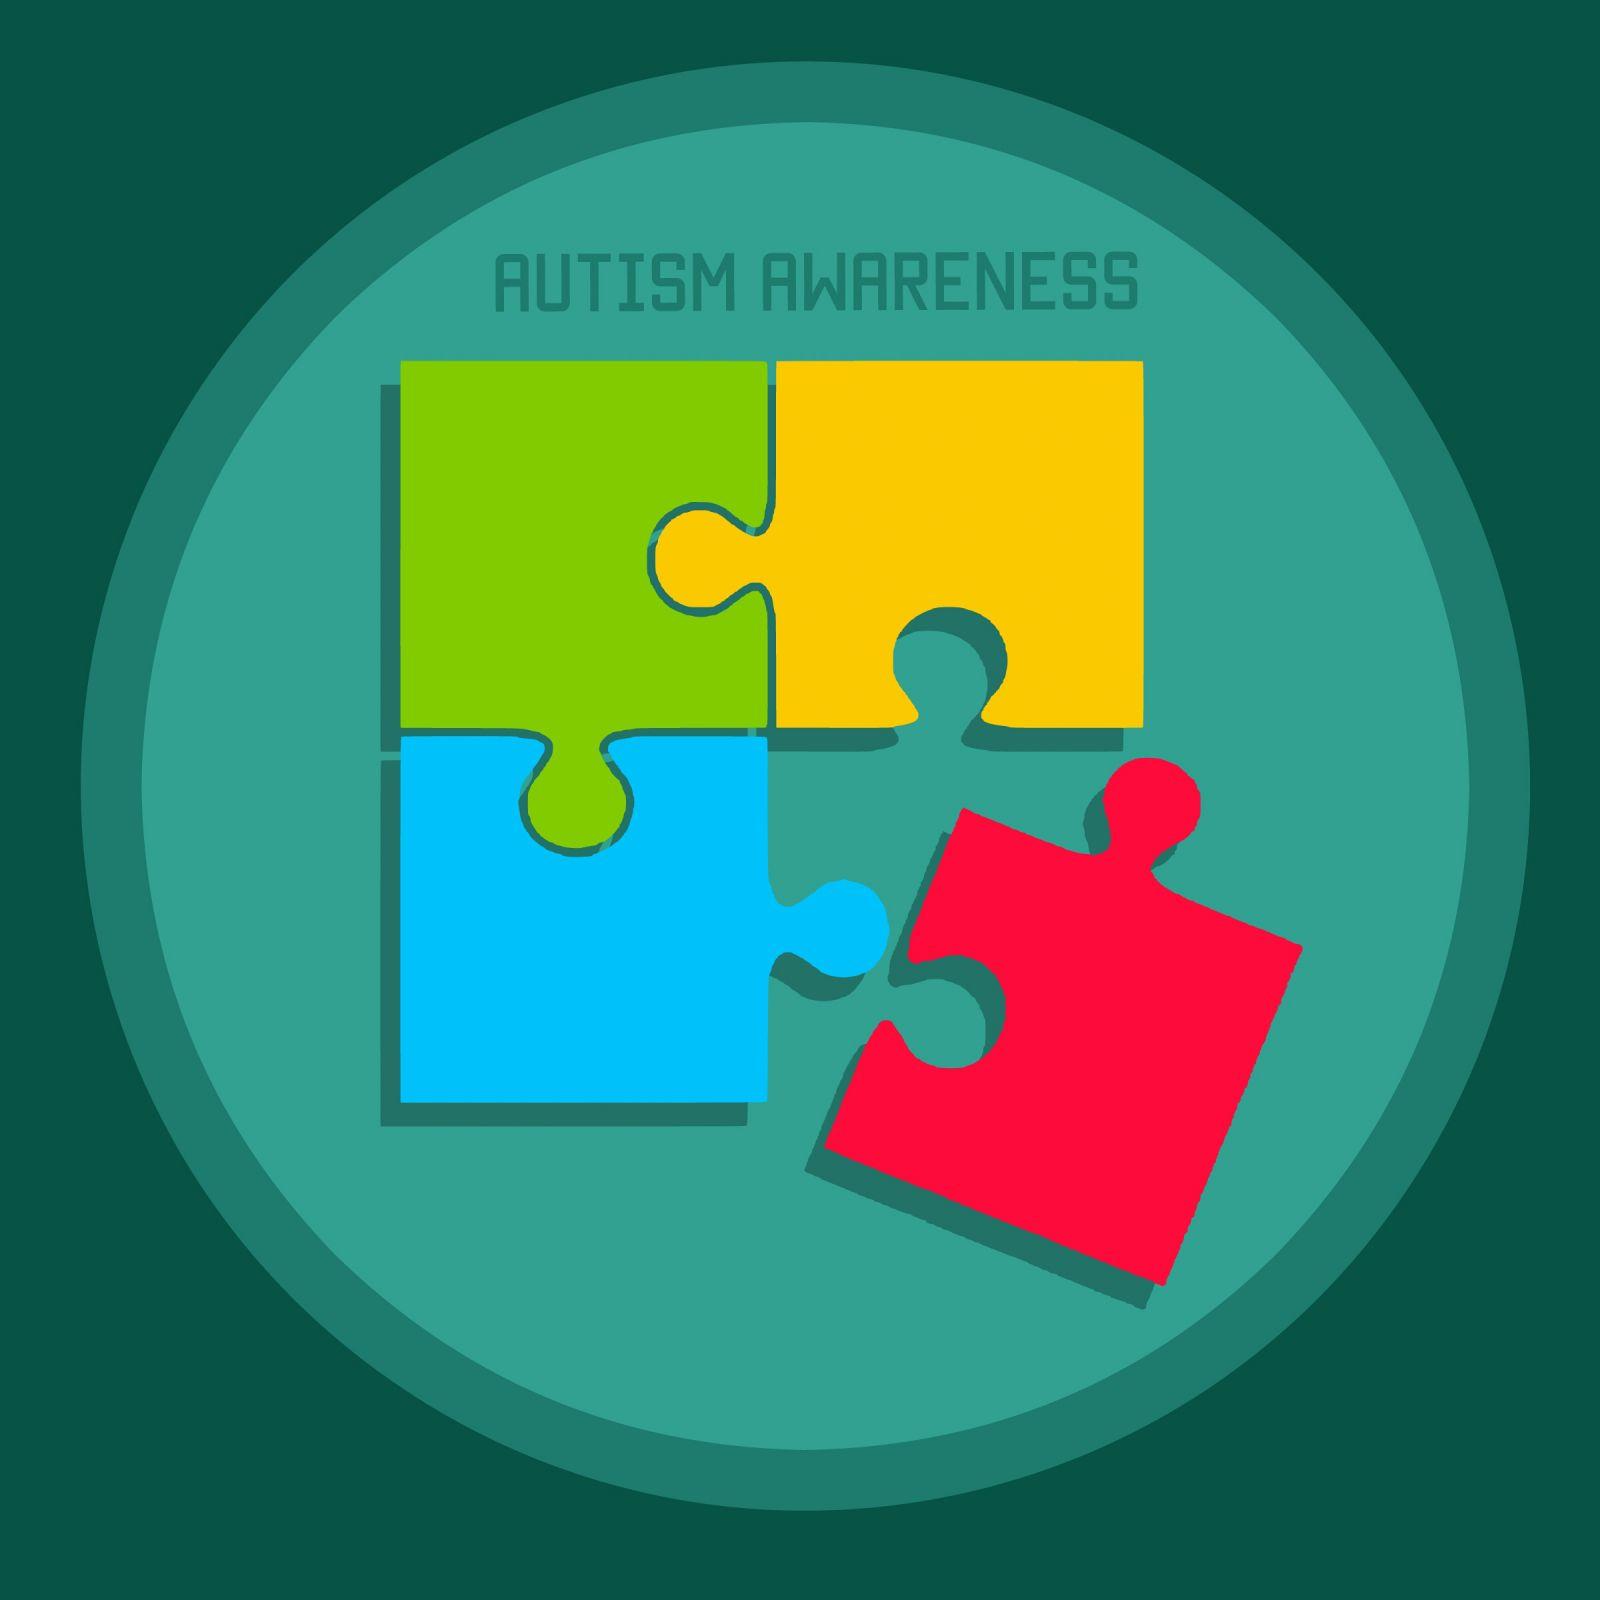 Autism Awareness banner image